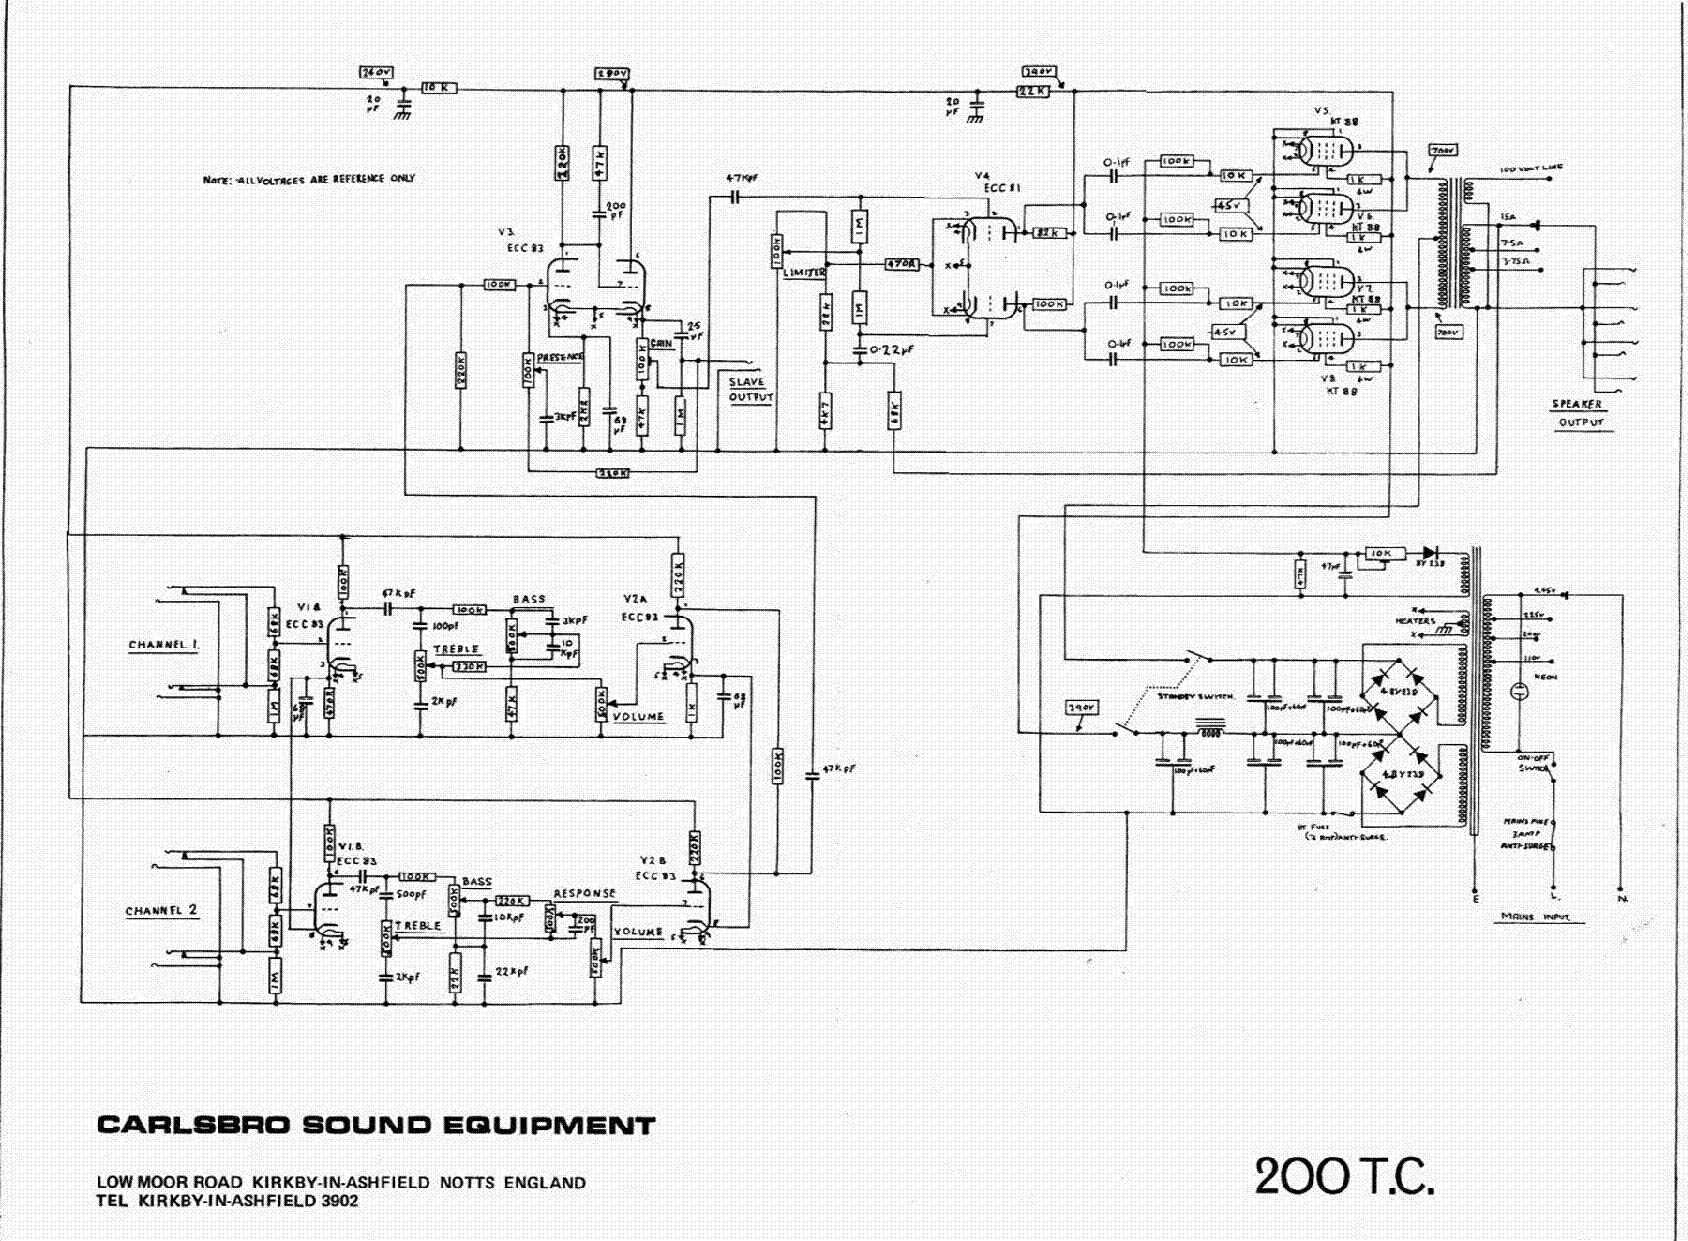 CARLSBRO 200TC SCH service manual (1st page)